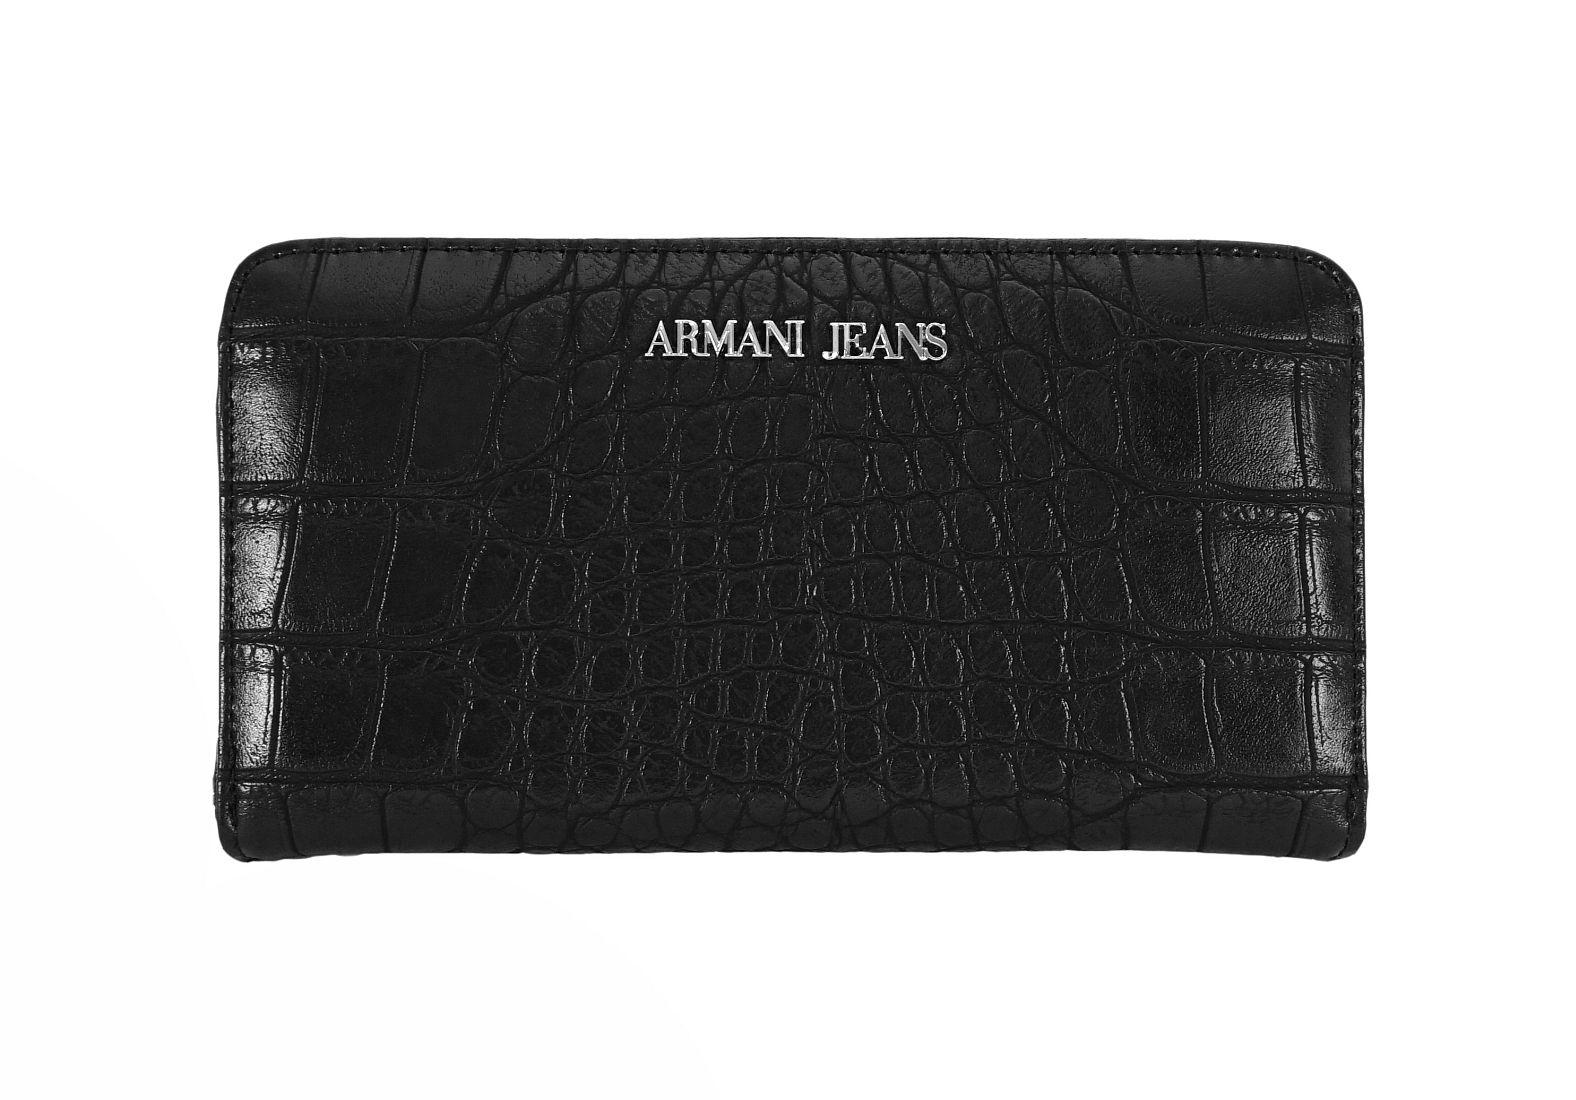 Armani Jeans Geldbörse Börse 928032 6A711 00020 nero HW16